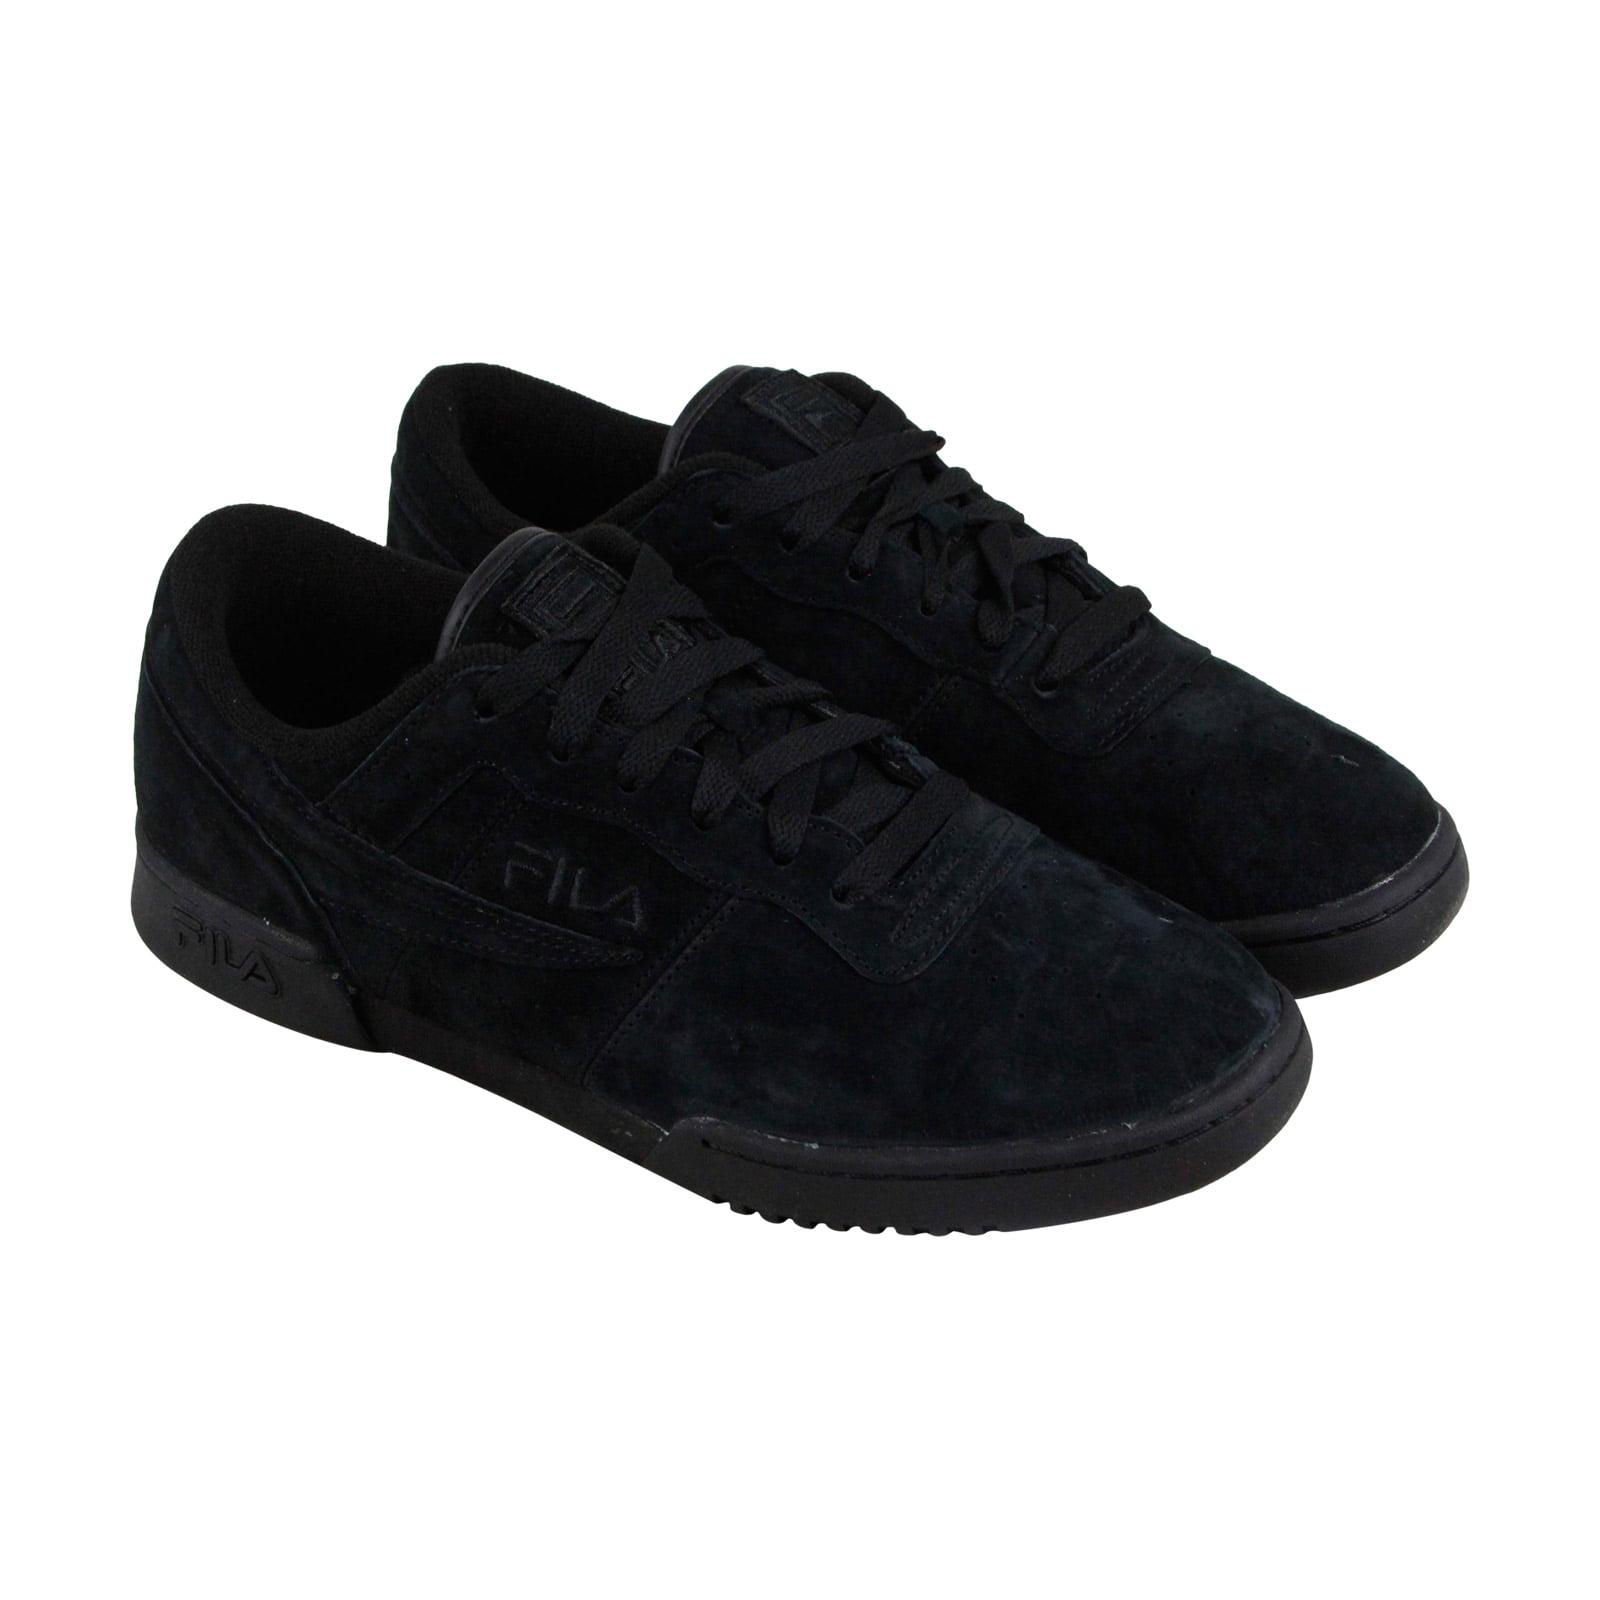 Fila Original Fitness Premium Mens Black Suede Lace Up Sneakers Shoes by Fila